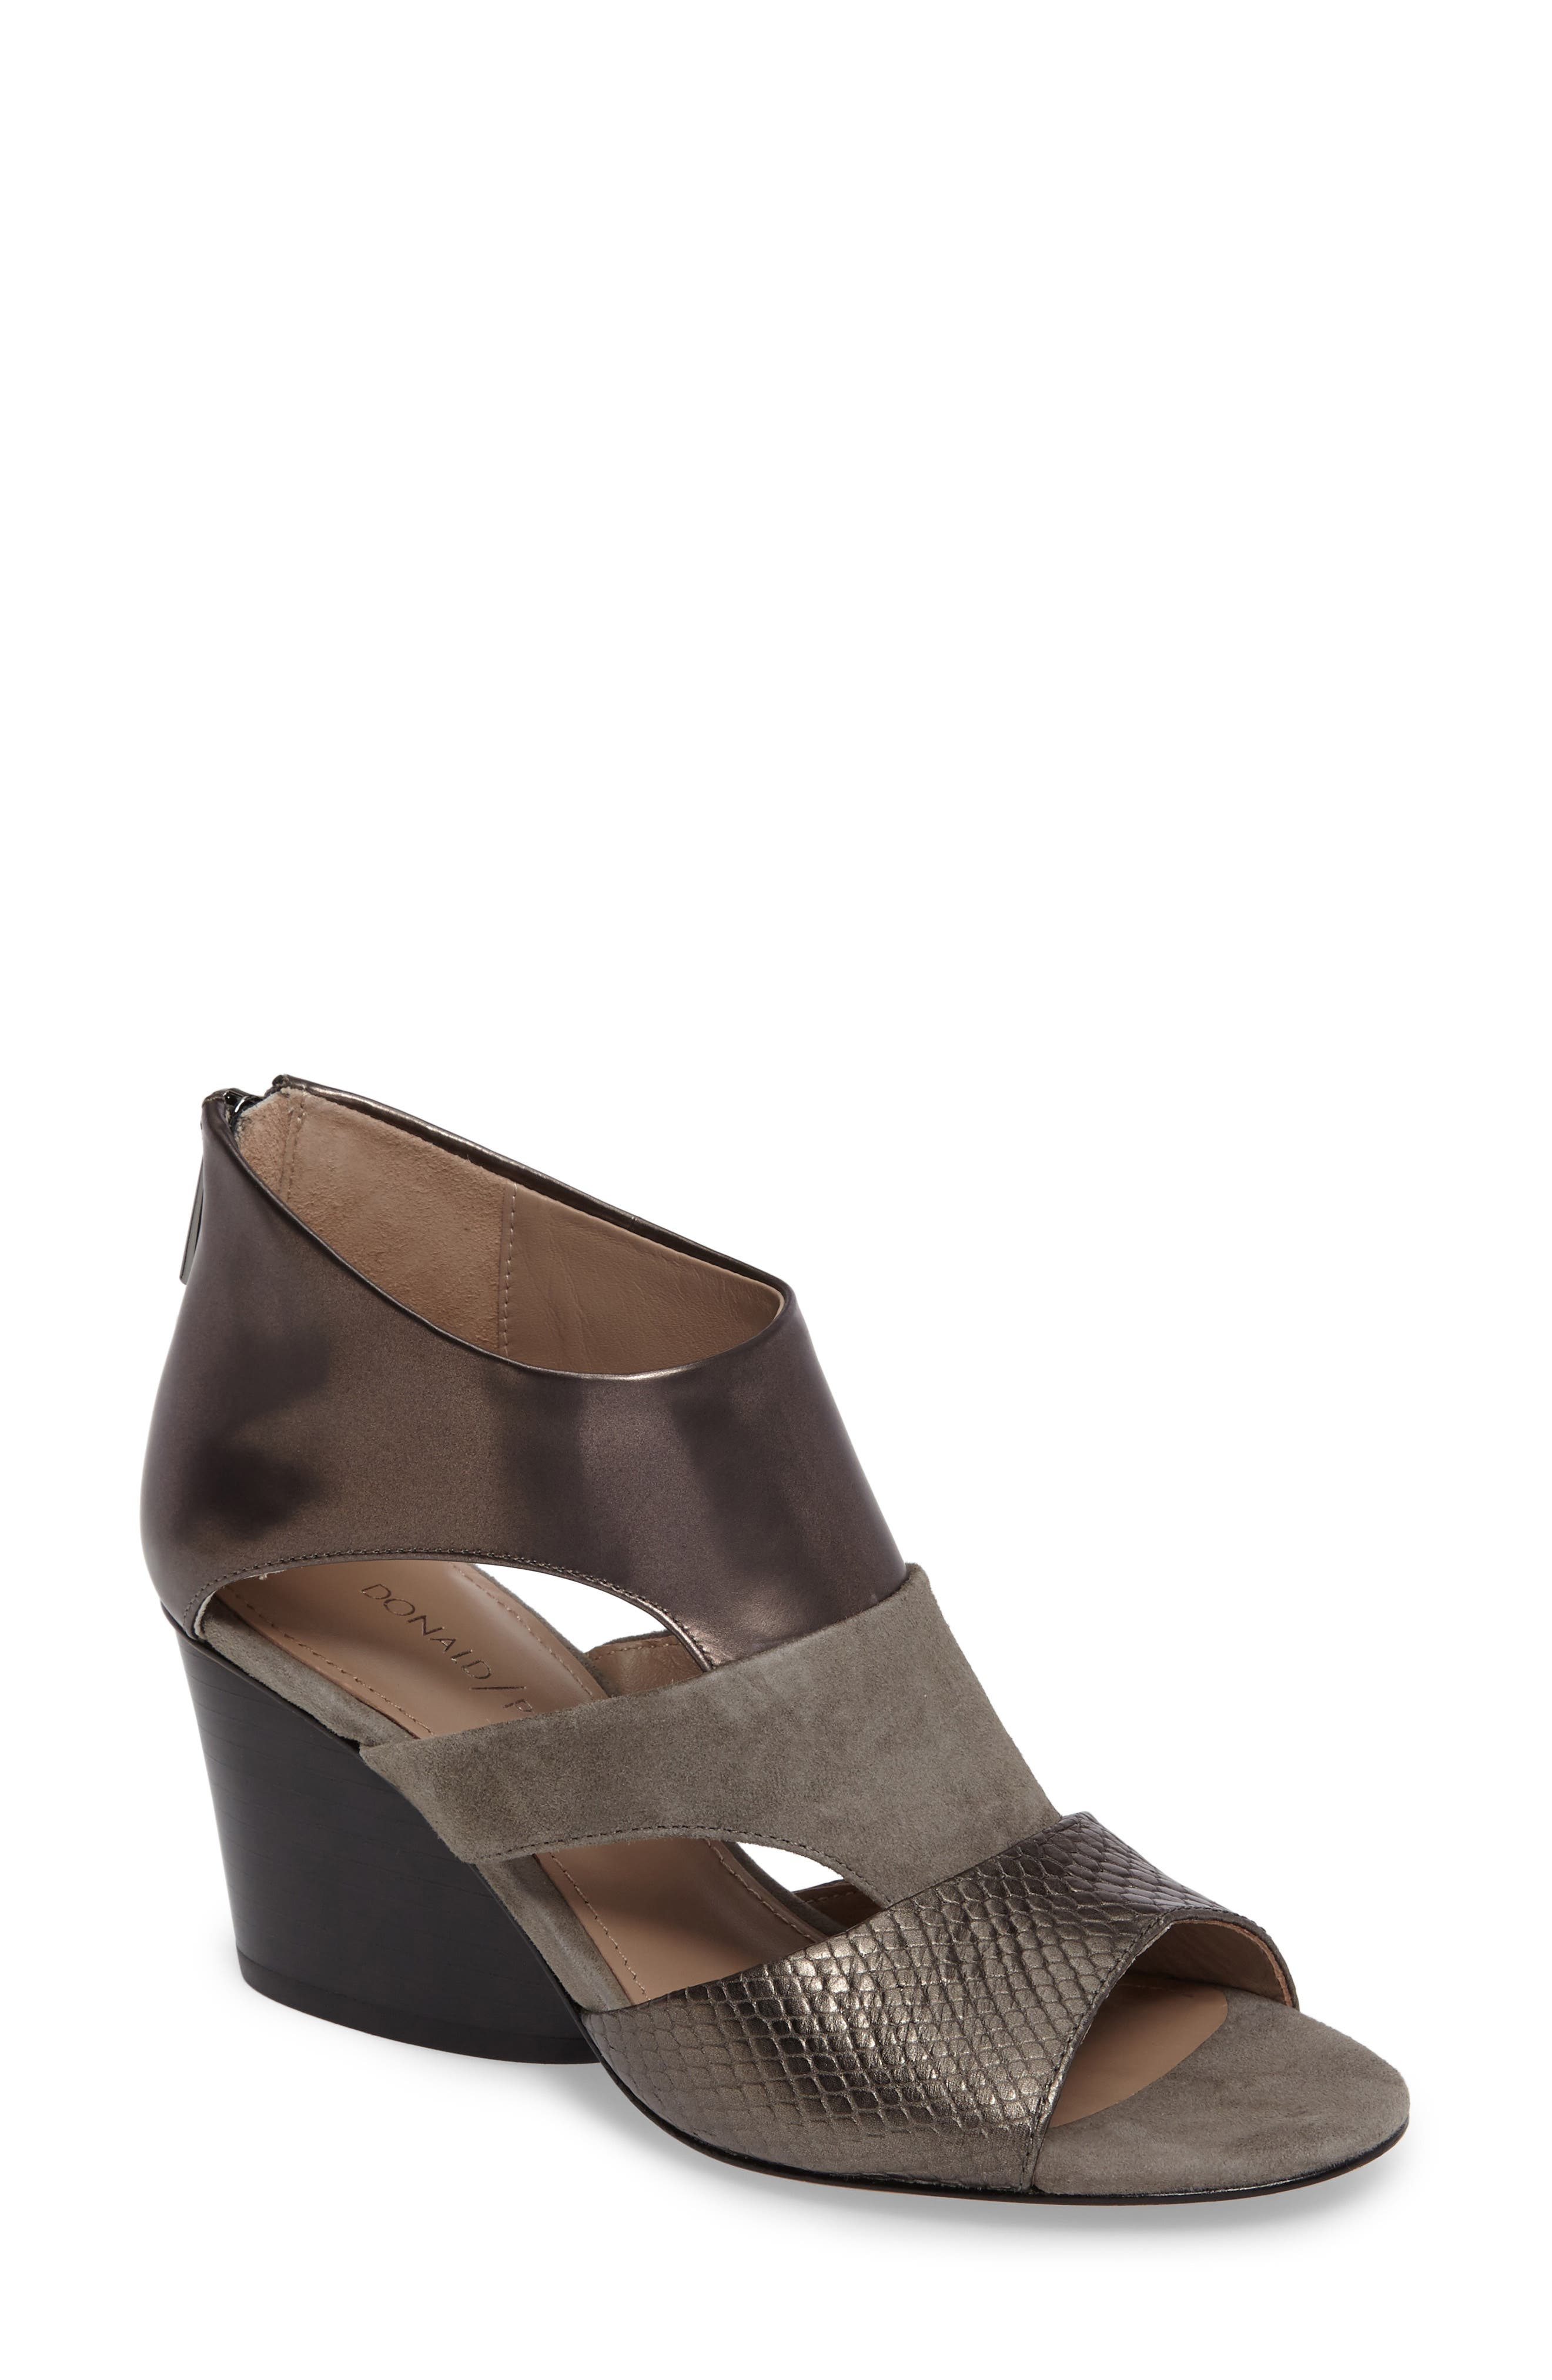 Jenkin Wedge Sandal,                             Main thumbnail 2, color,